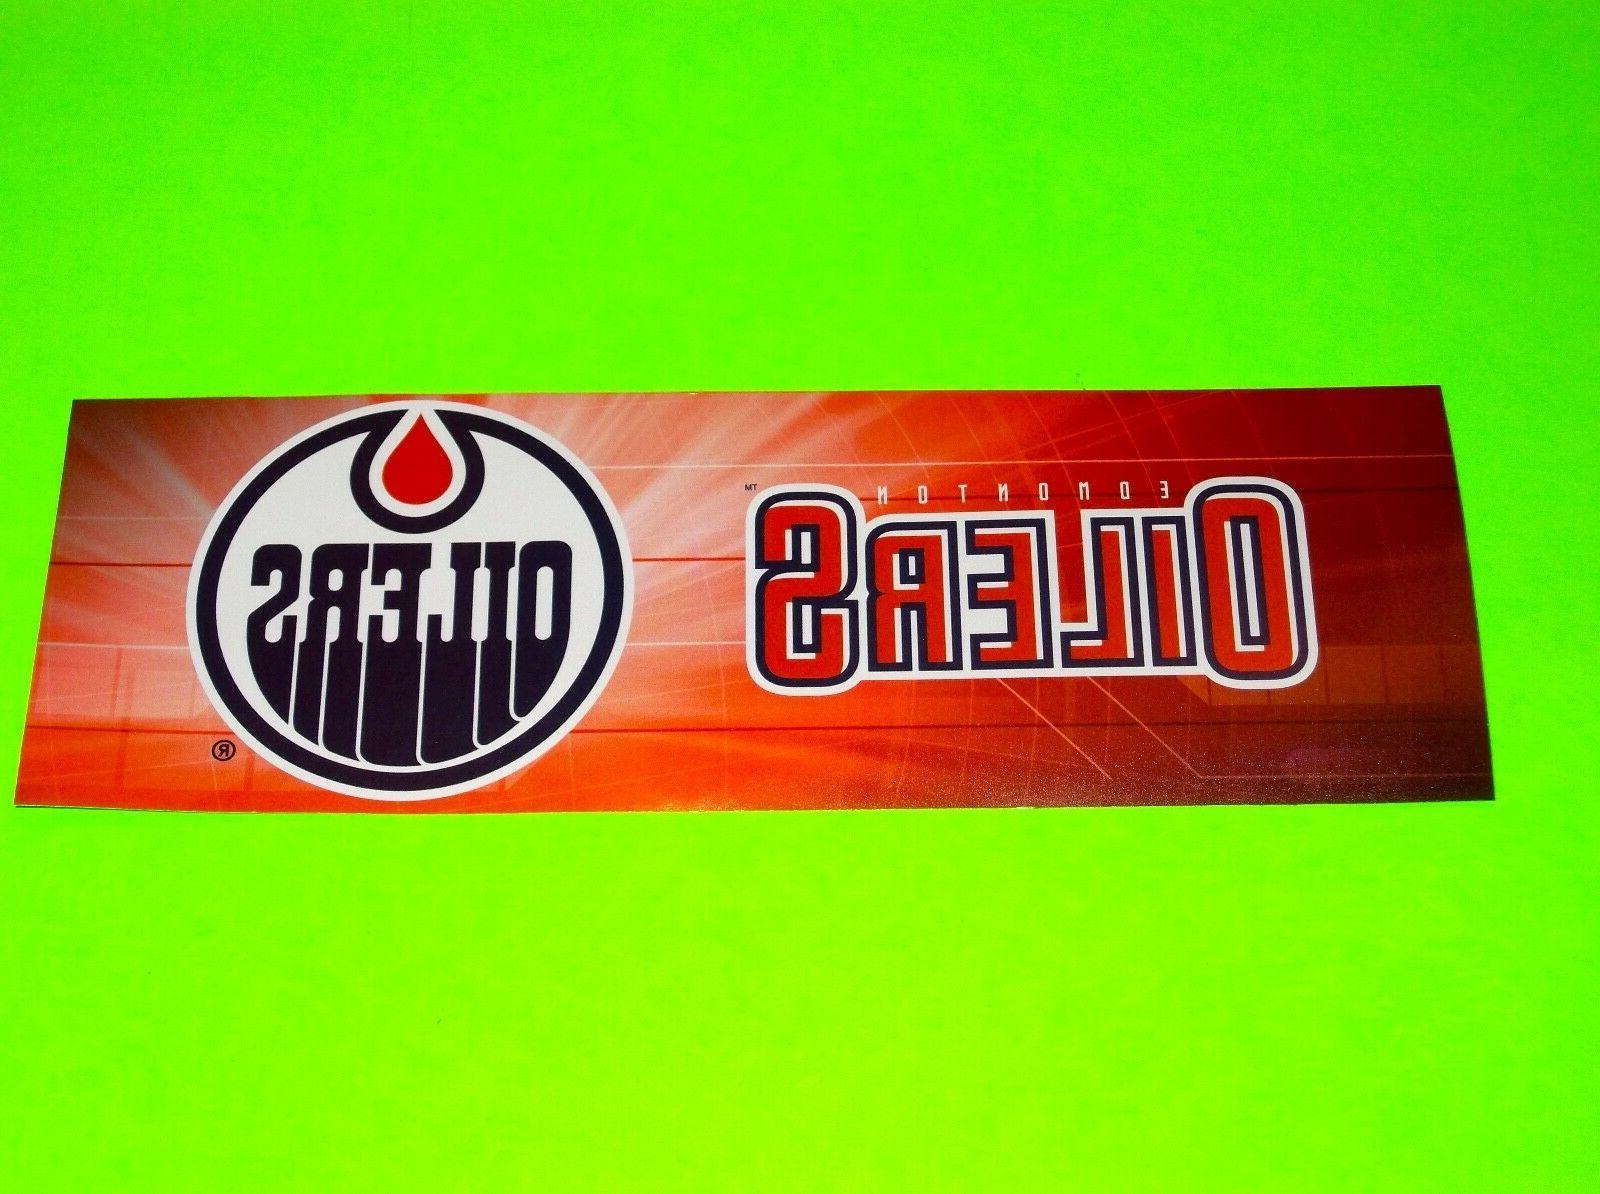 edmonton oilers canada nhl hockey team car